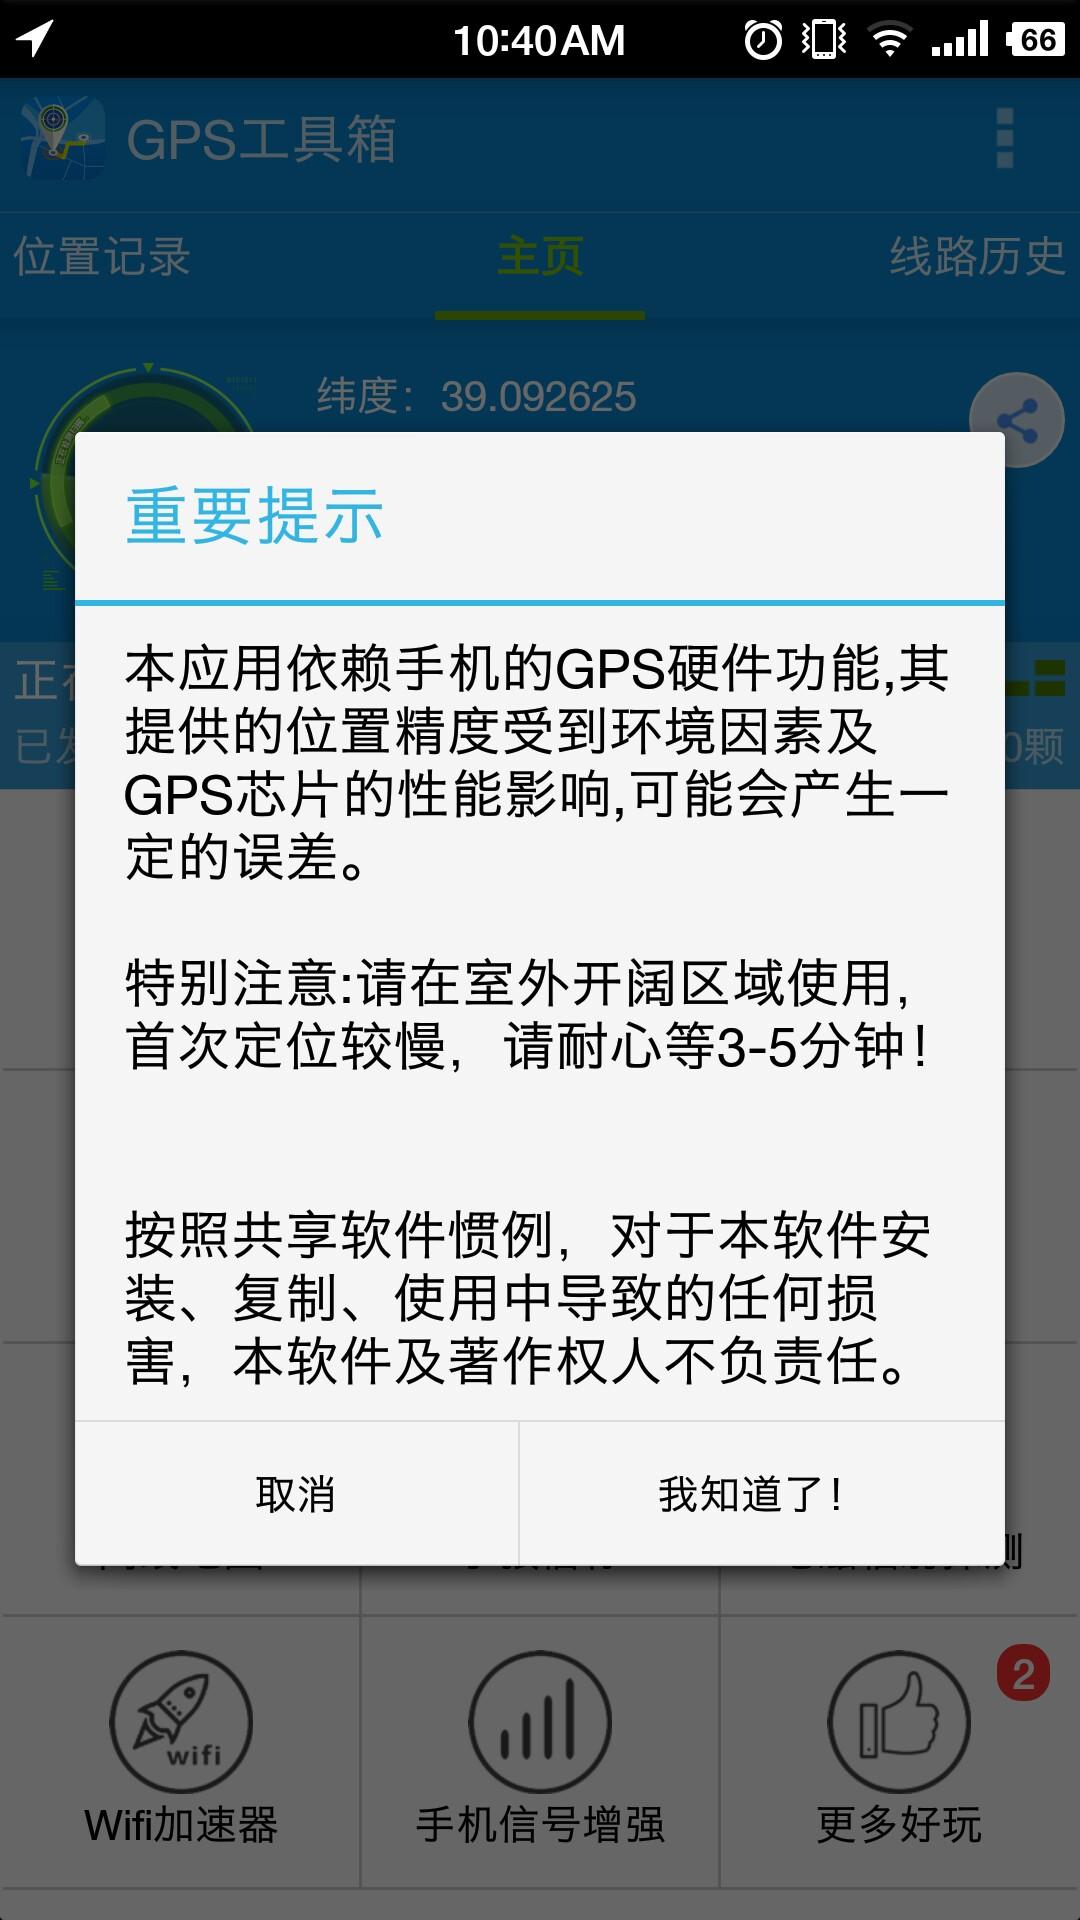 Screenshot_2016-06-16-10-40-19-309_GPS???.png